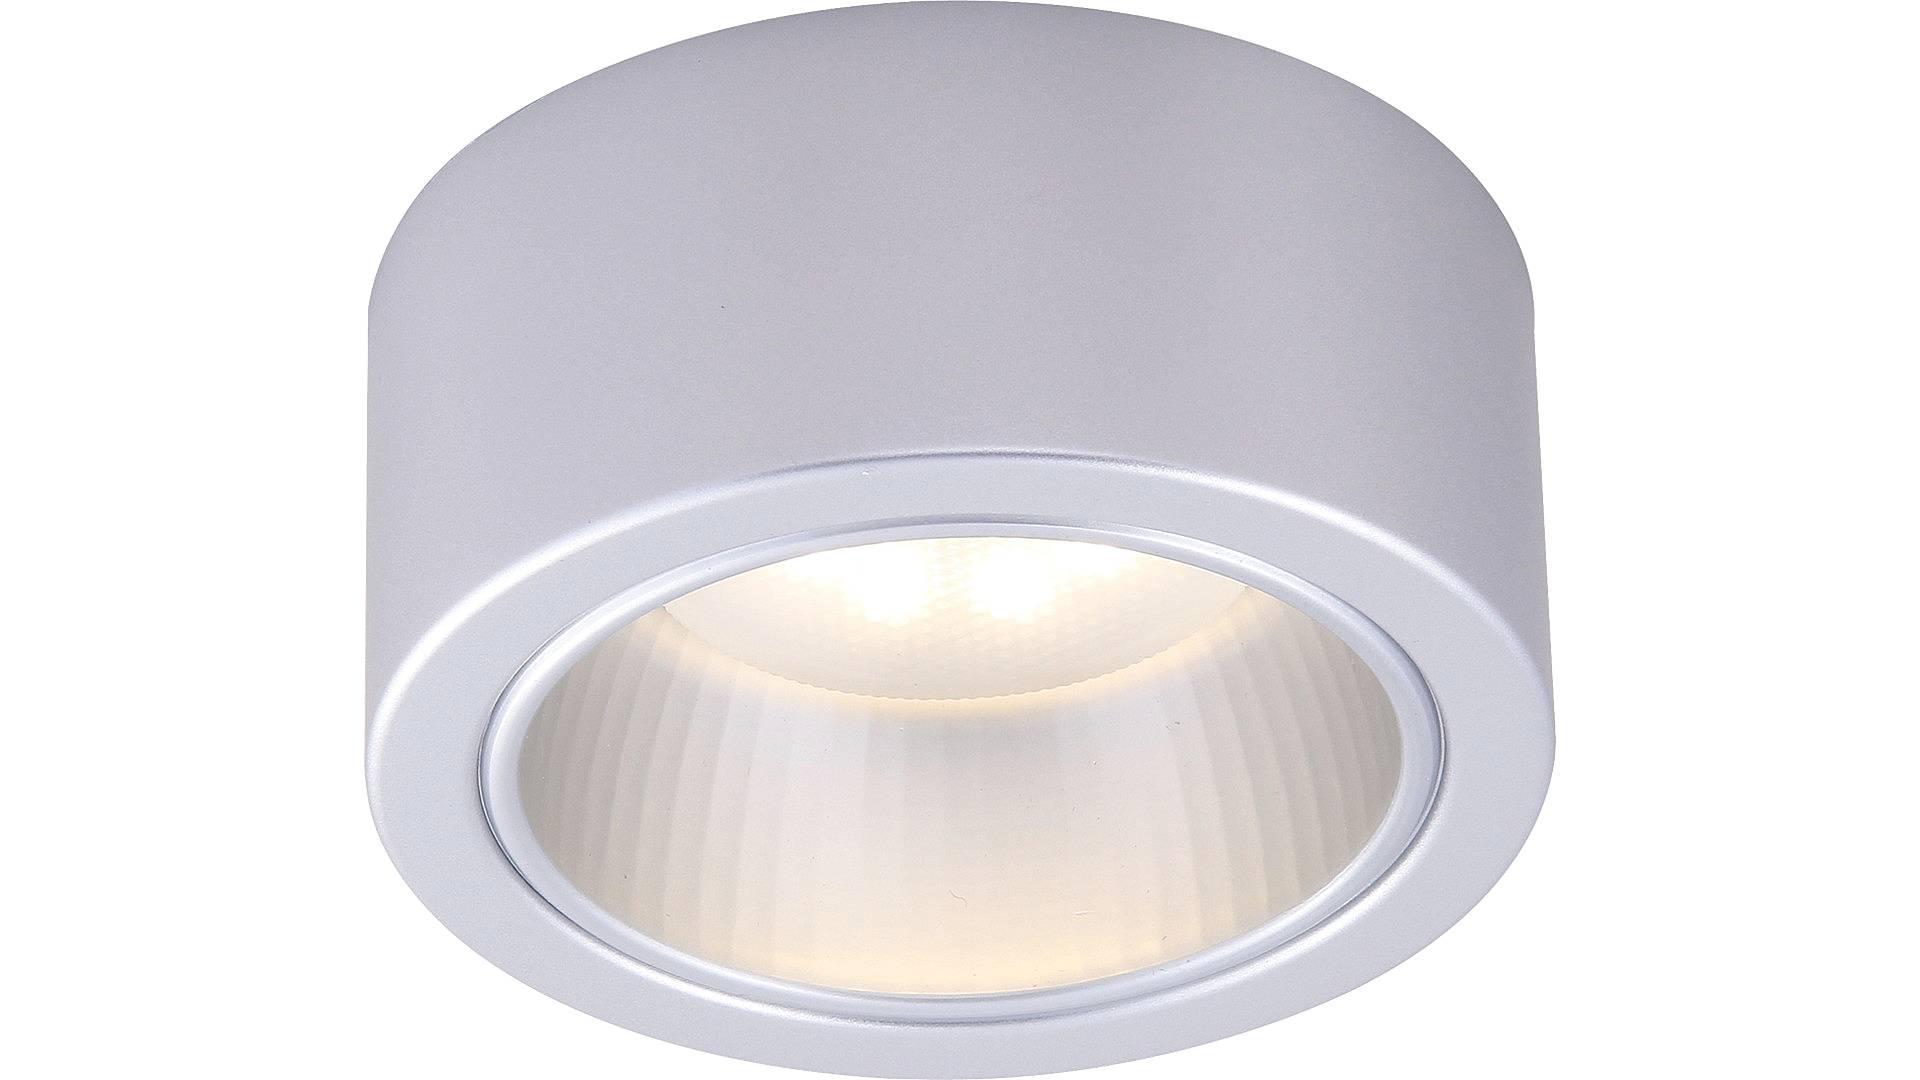 Фото товара A5553PL-1GY Arte Lamp